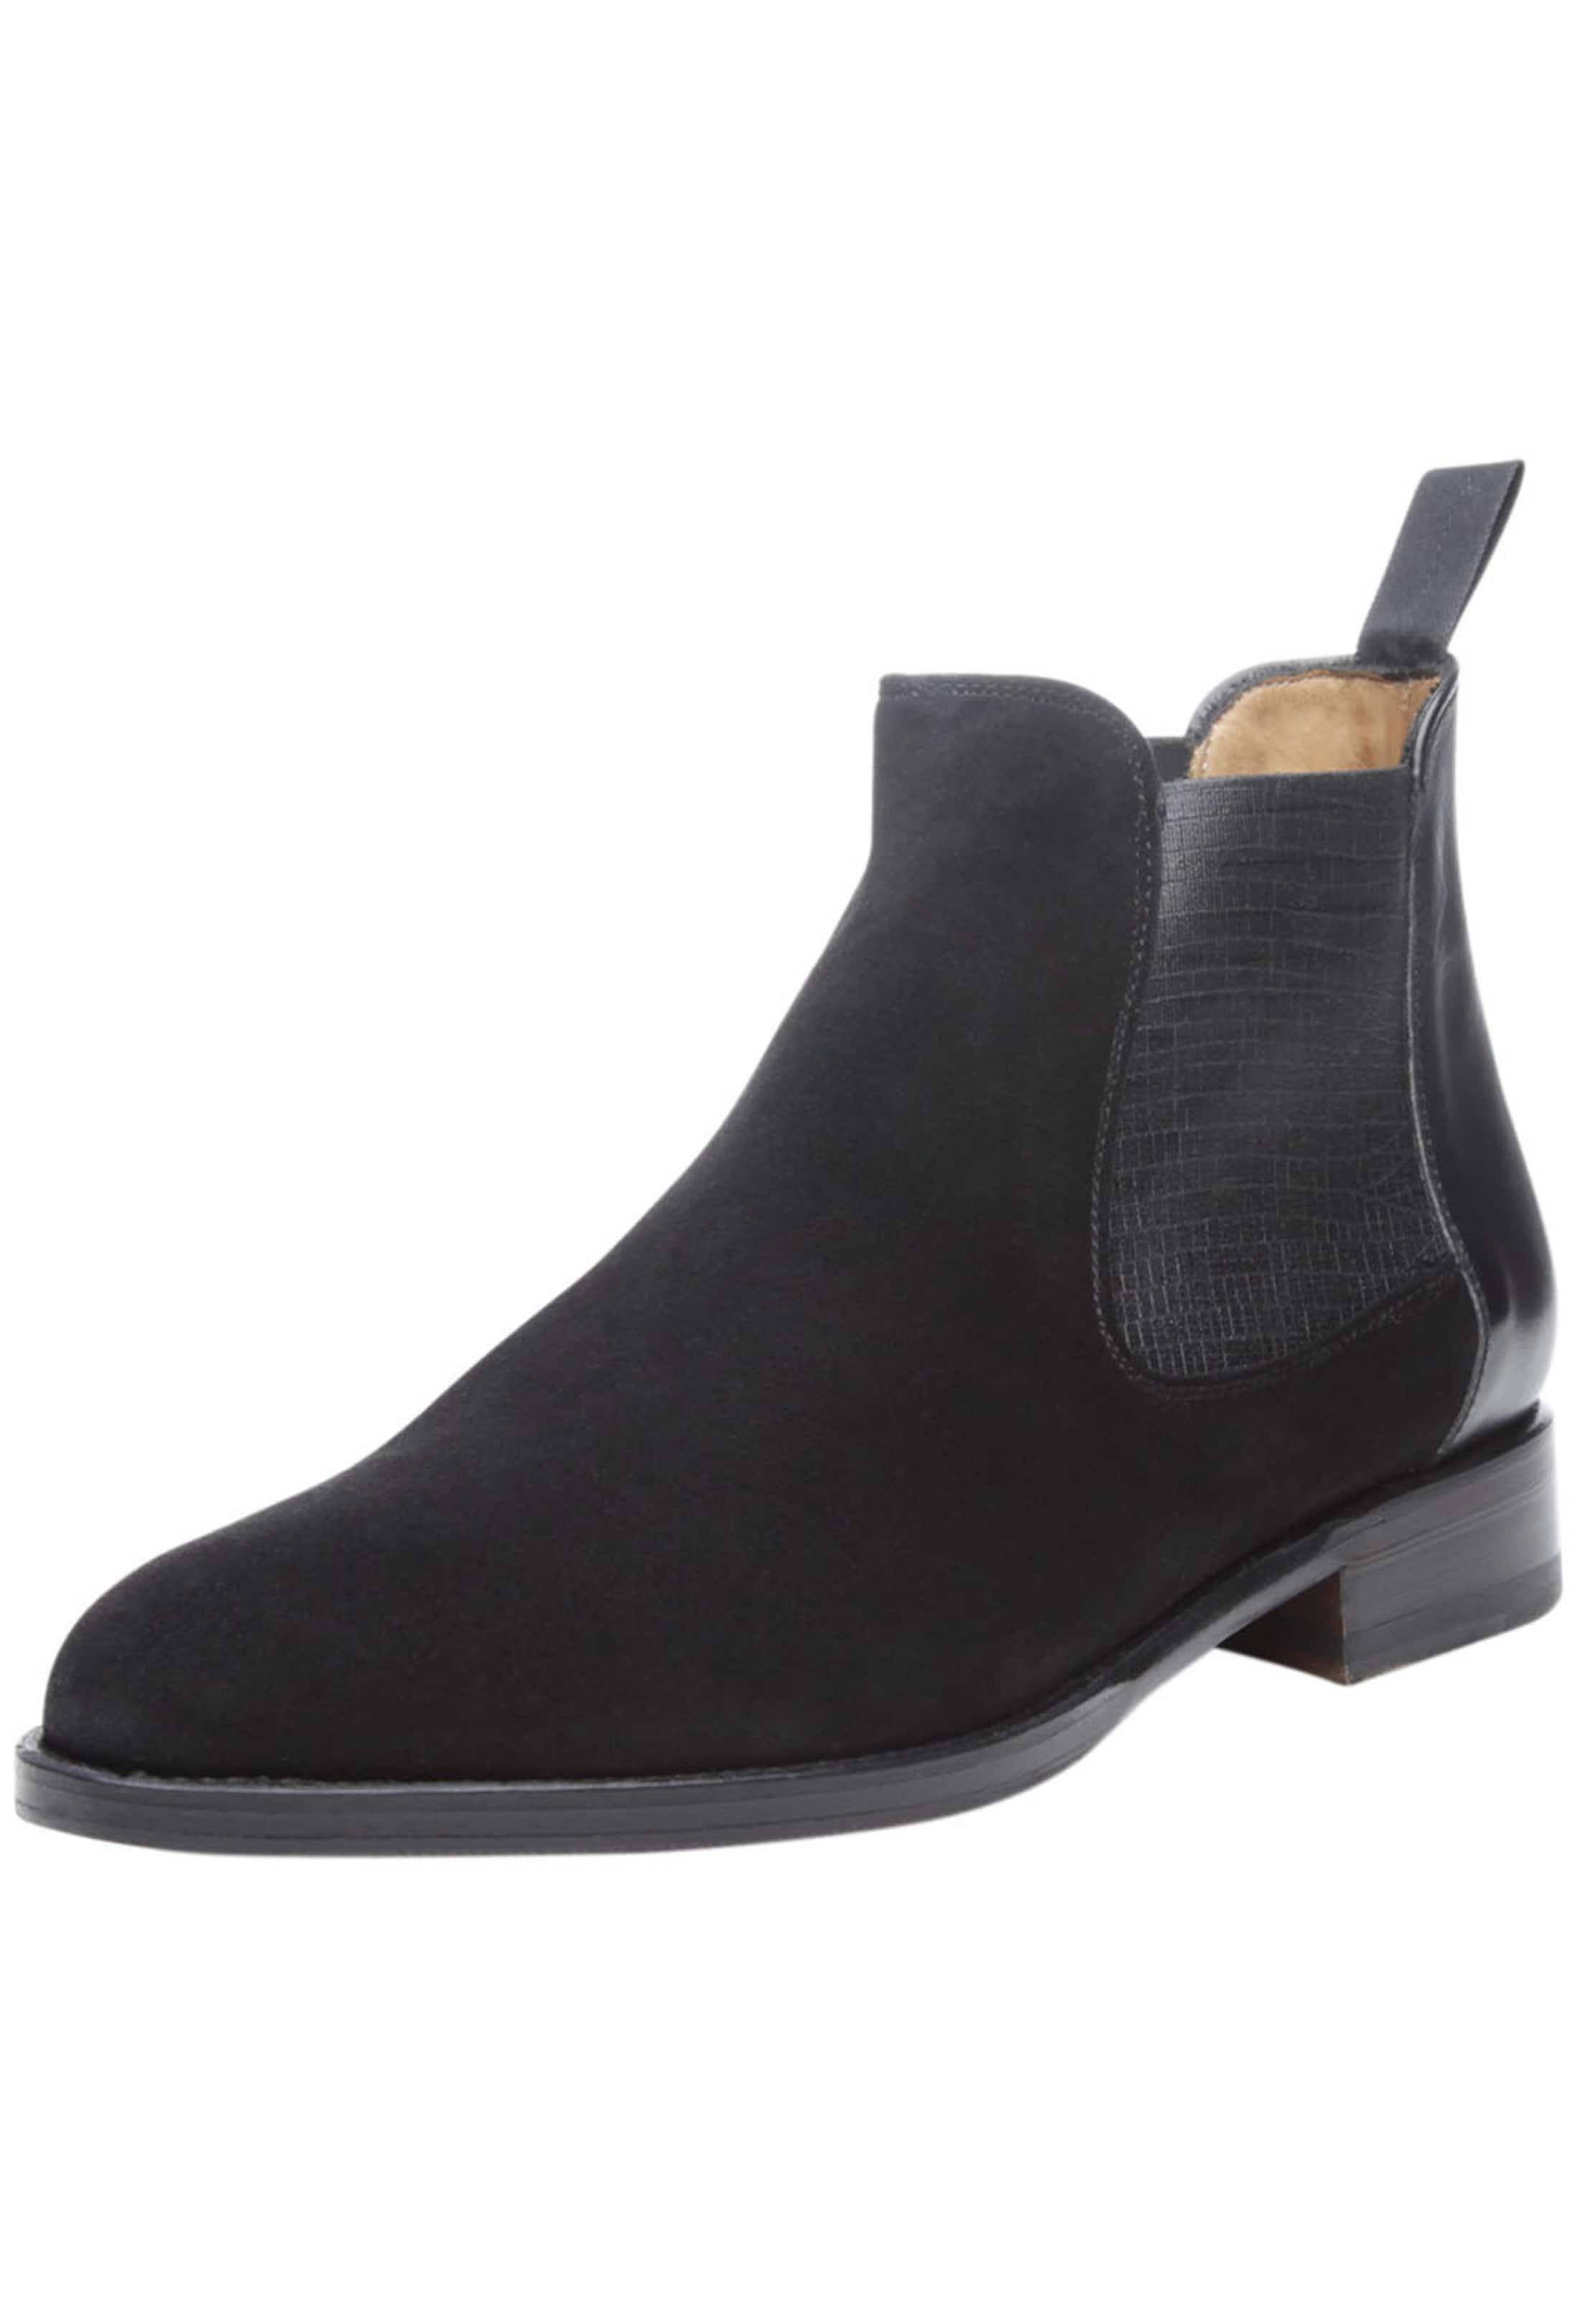 SHOEPASSION '   Stiefeletten ' No. 2300 ' SHOEPASSION Schuhe Gut getragene Schuhe 8cc703